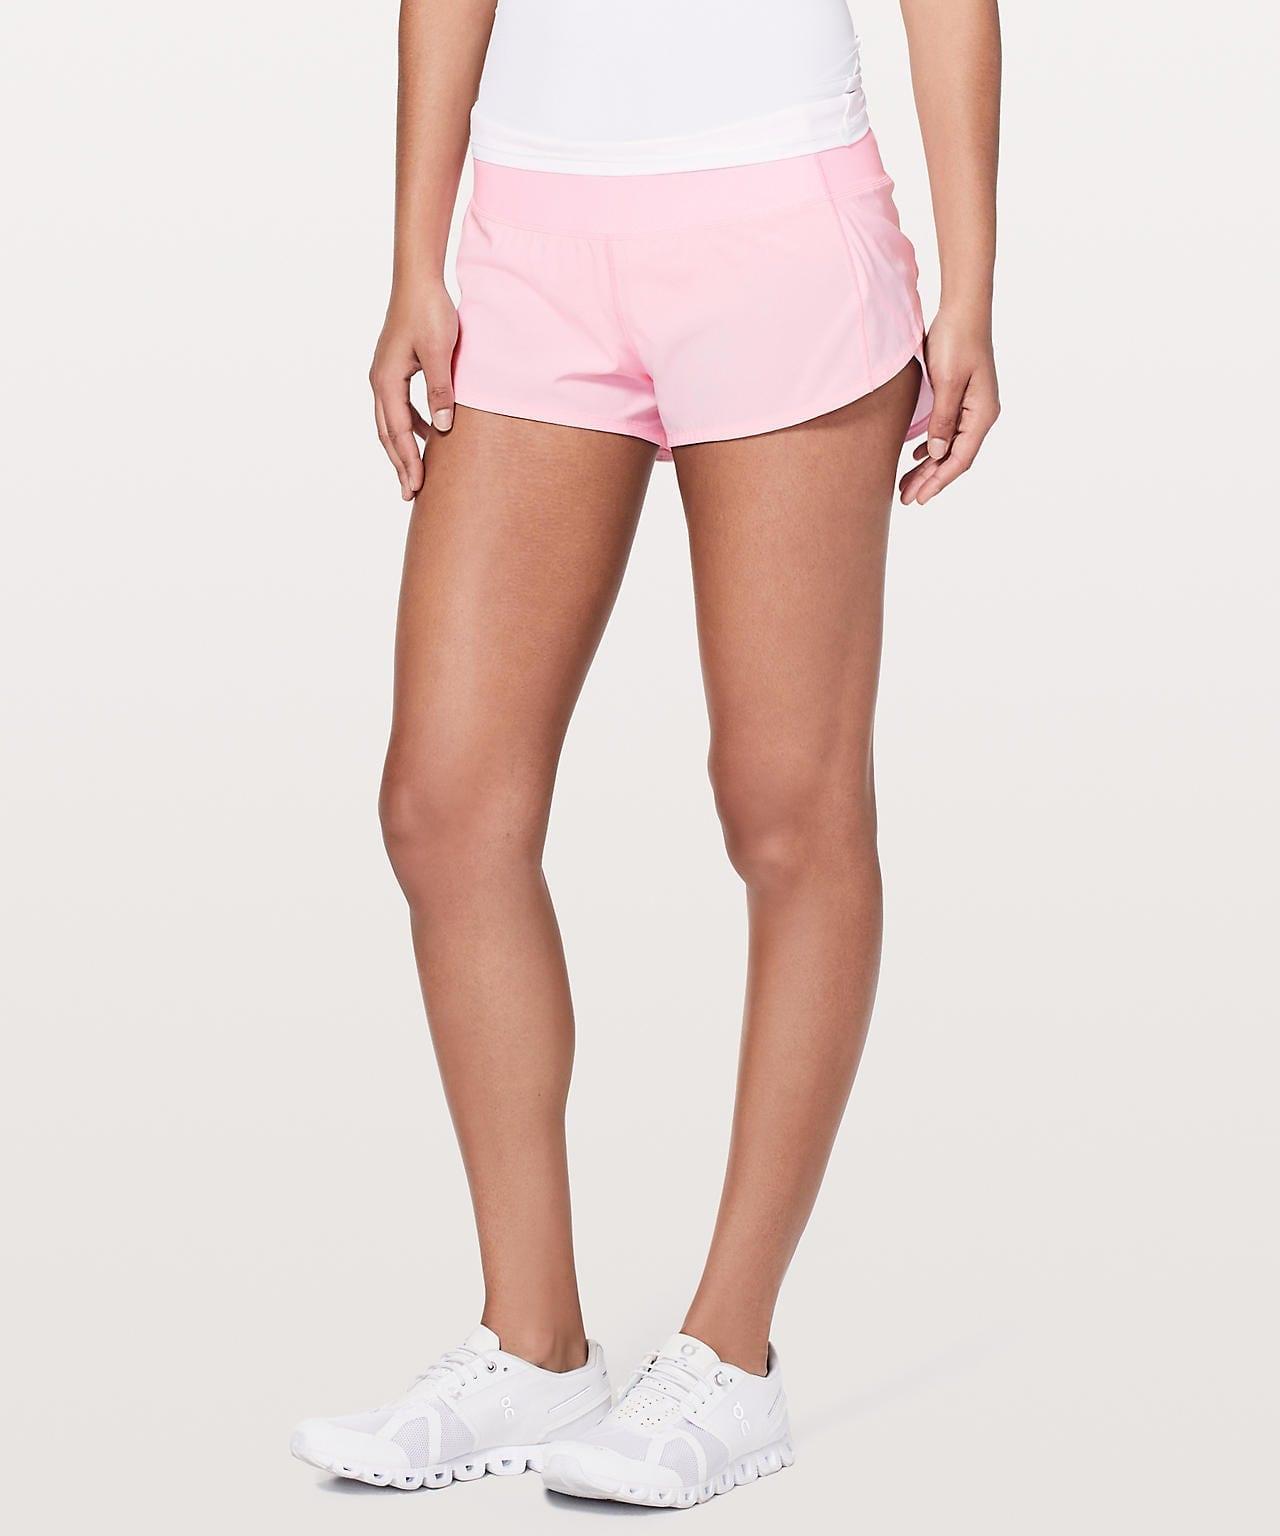 Speed Up Short - Miami Pink